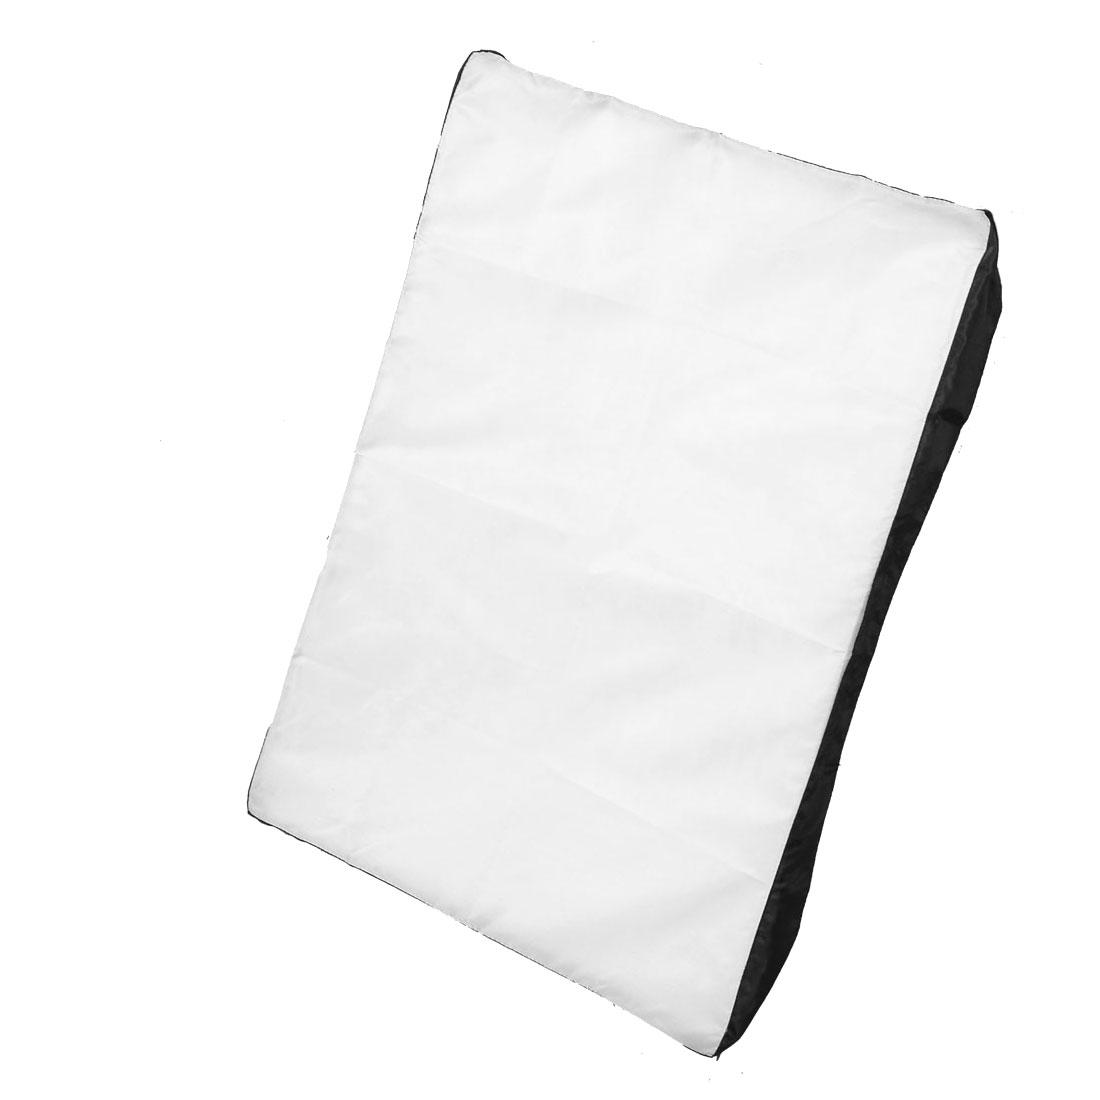 50cm x 50cm Studio Photography Flash Softbox Diffuser Black White